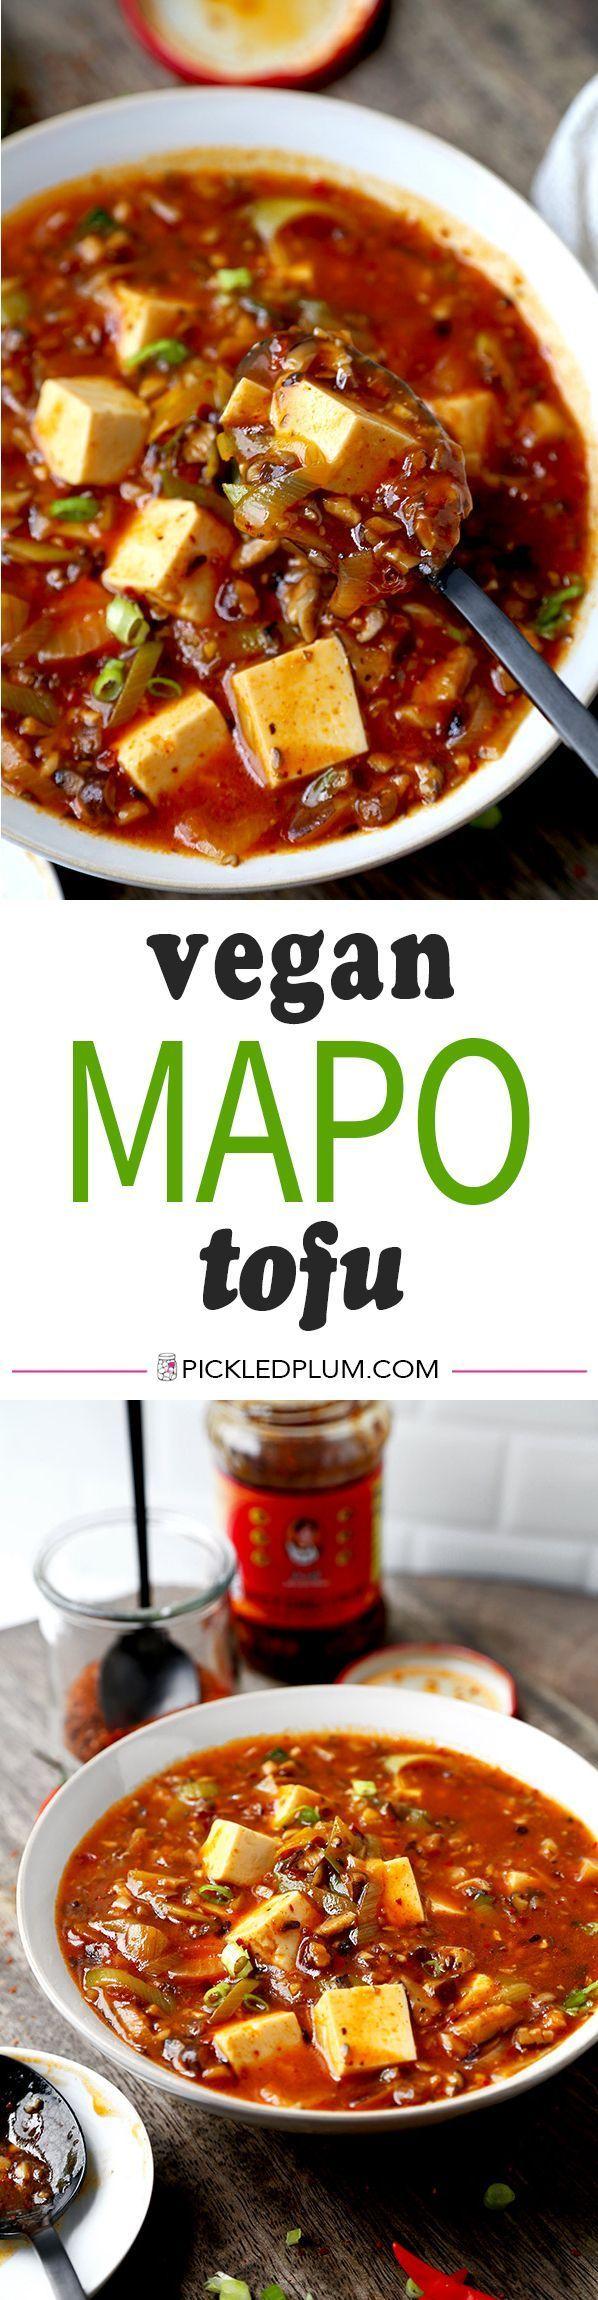 The Ultimate Vegan Mapo Tofu - Mushrooms make this vegan mapo tofu recipe tastier and healthier than the ground meat version. It's amazing! Chinese food recipes   mapo tofu recipe   meatless dinner recipe   pickledplum.com